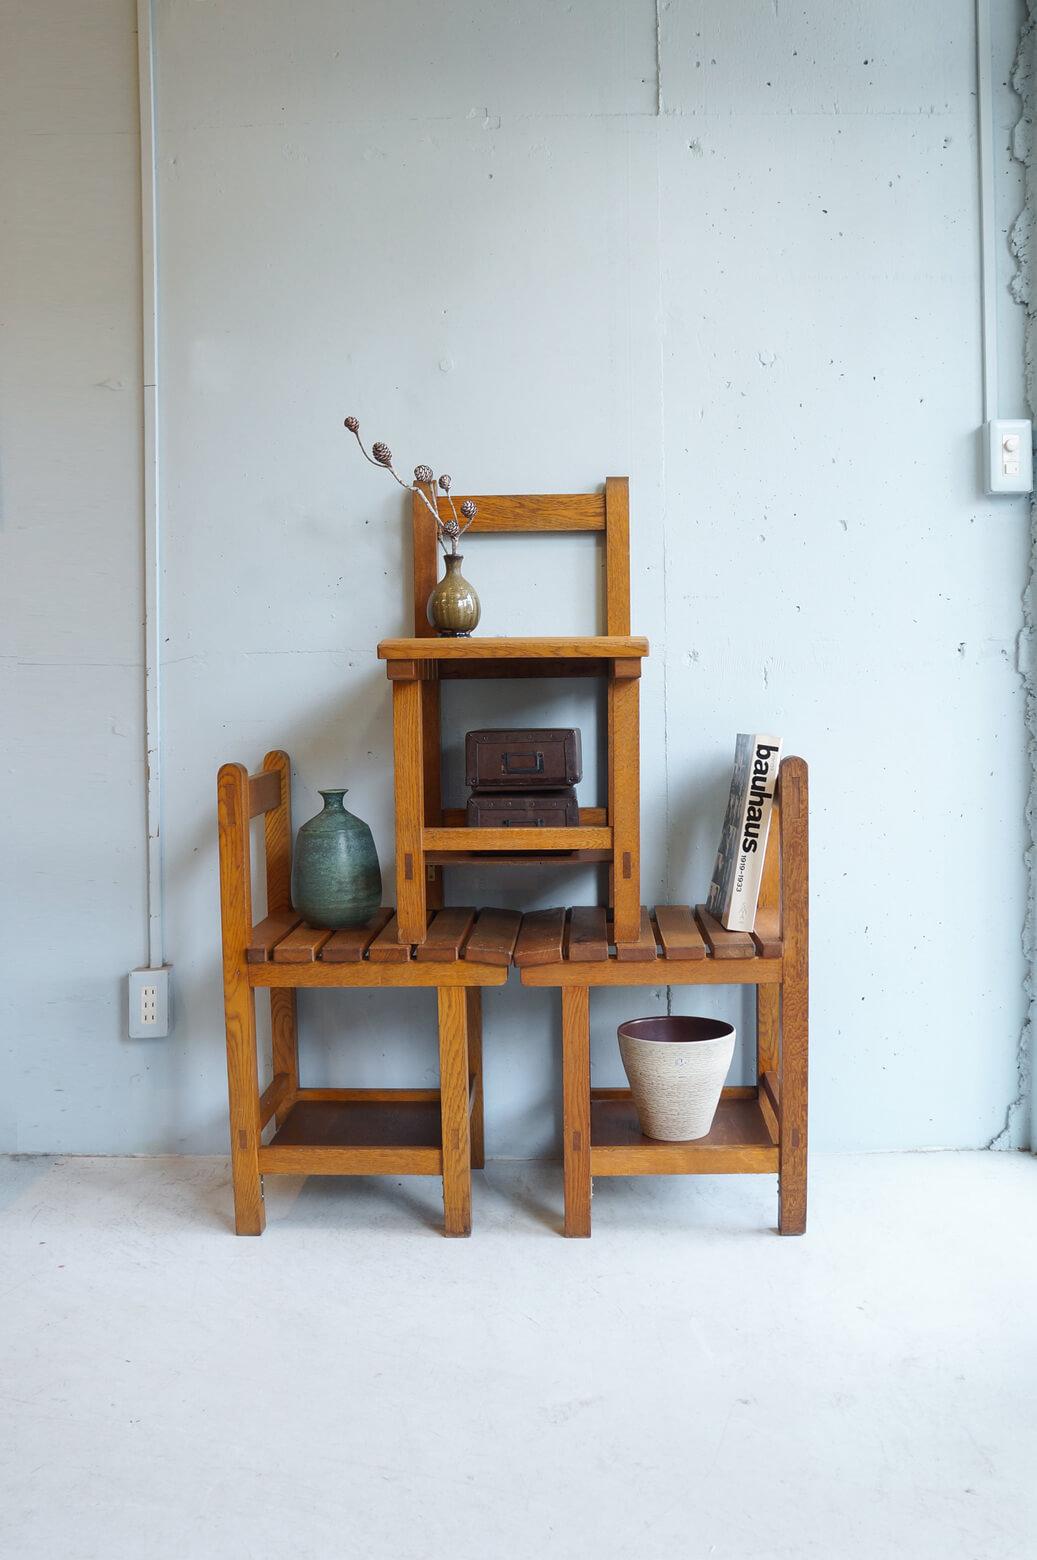 Vintage Wooden School Chair/ヴィンテージ スクールチェア 学校椅子 レトロ